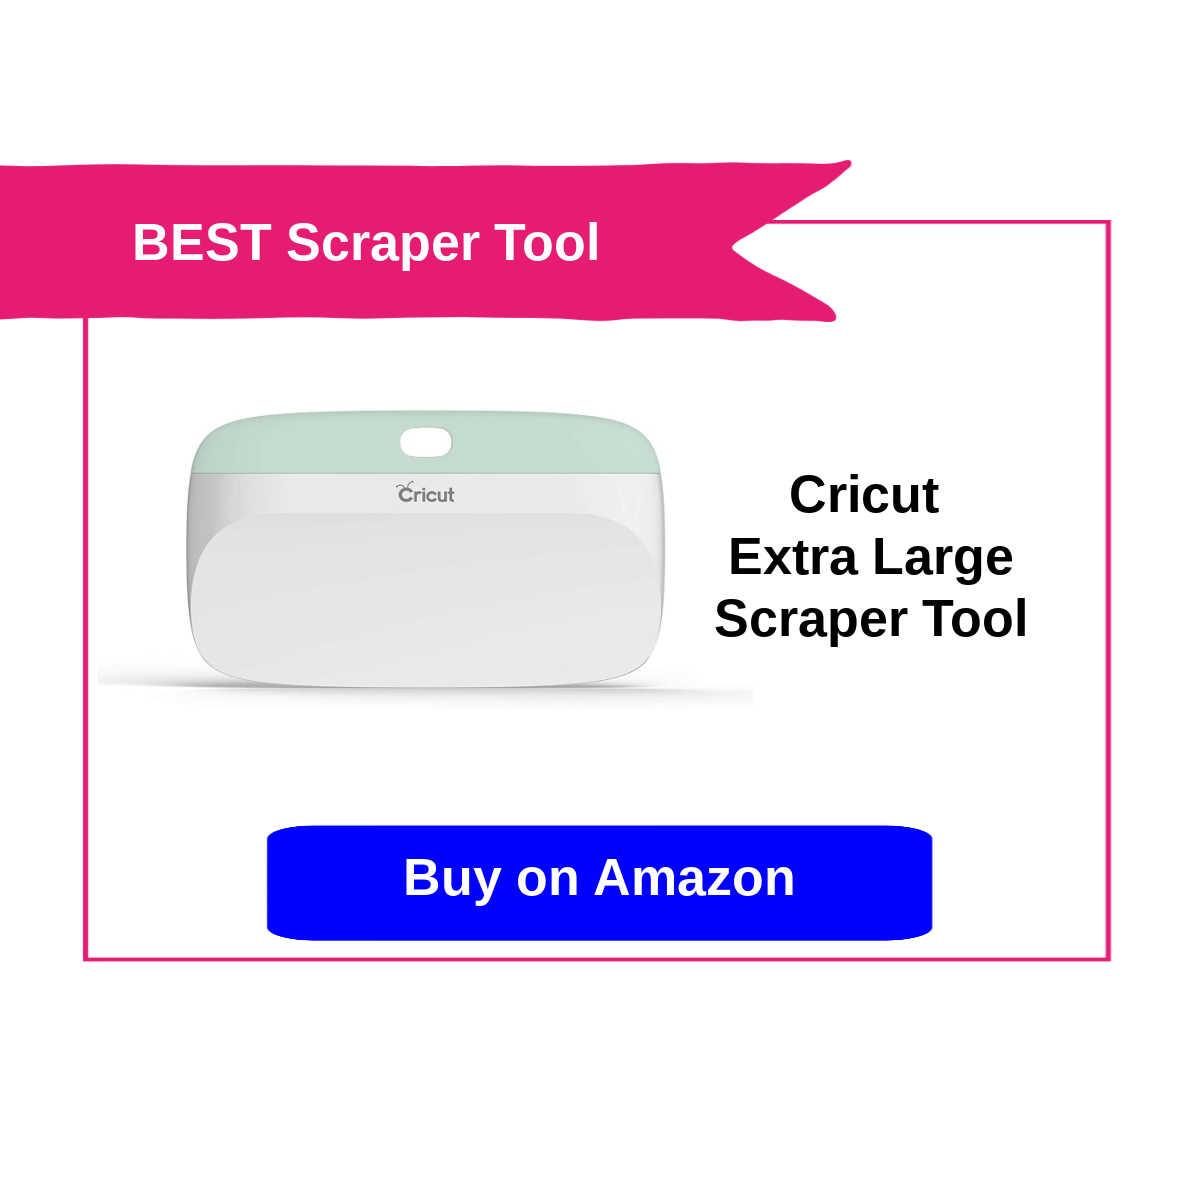 The best scraper tool for applying adhesive vinyl